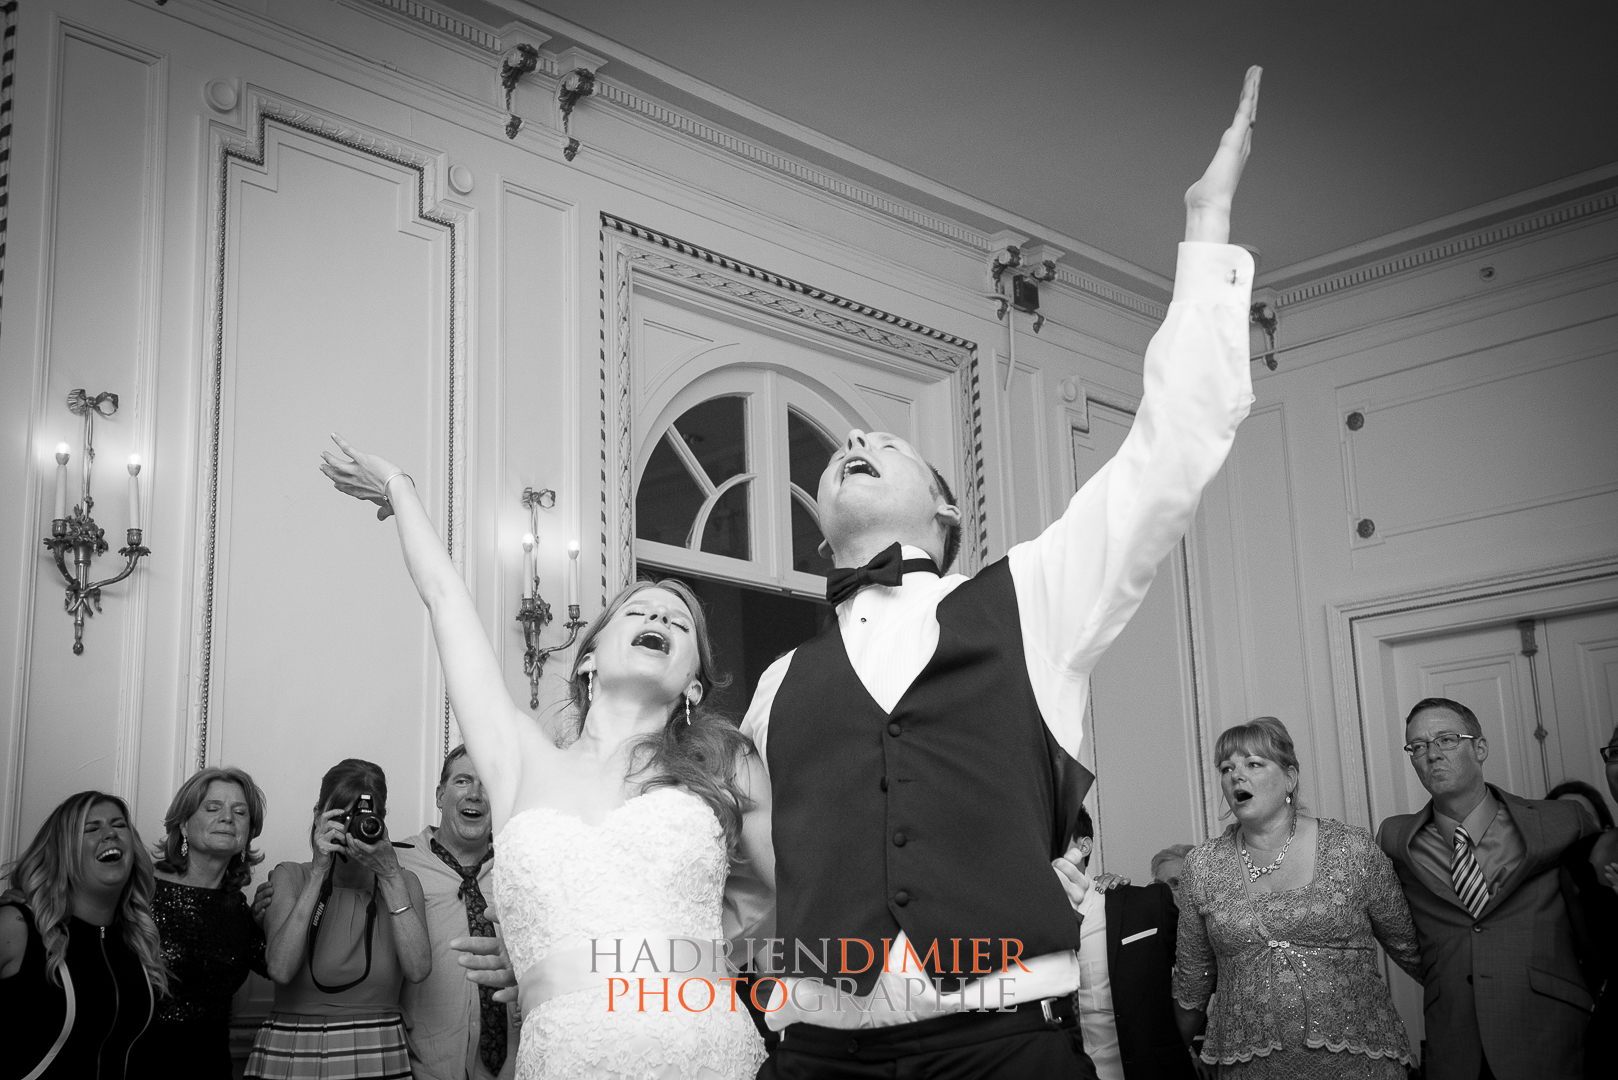 Wilson-Stevens-Productions-Splash-Band-Wedding-Hadrien Dimier Photographie-160422-00643